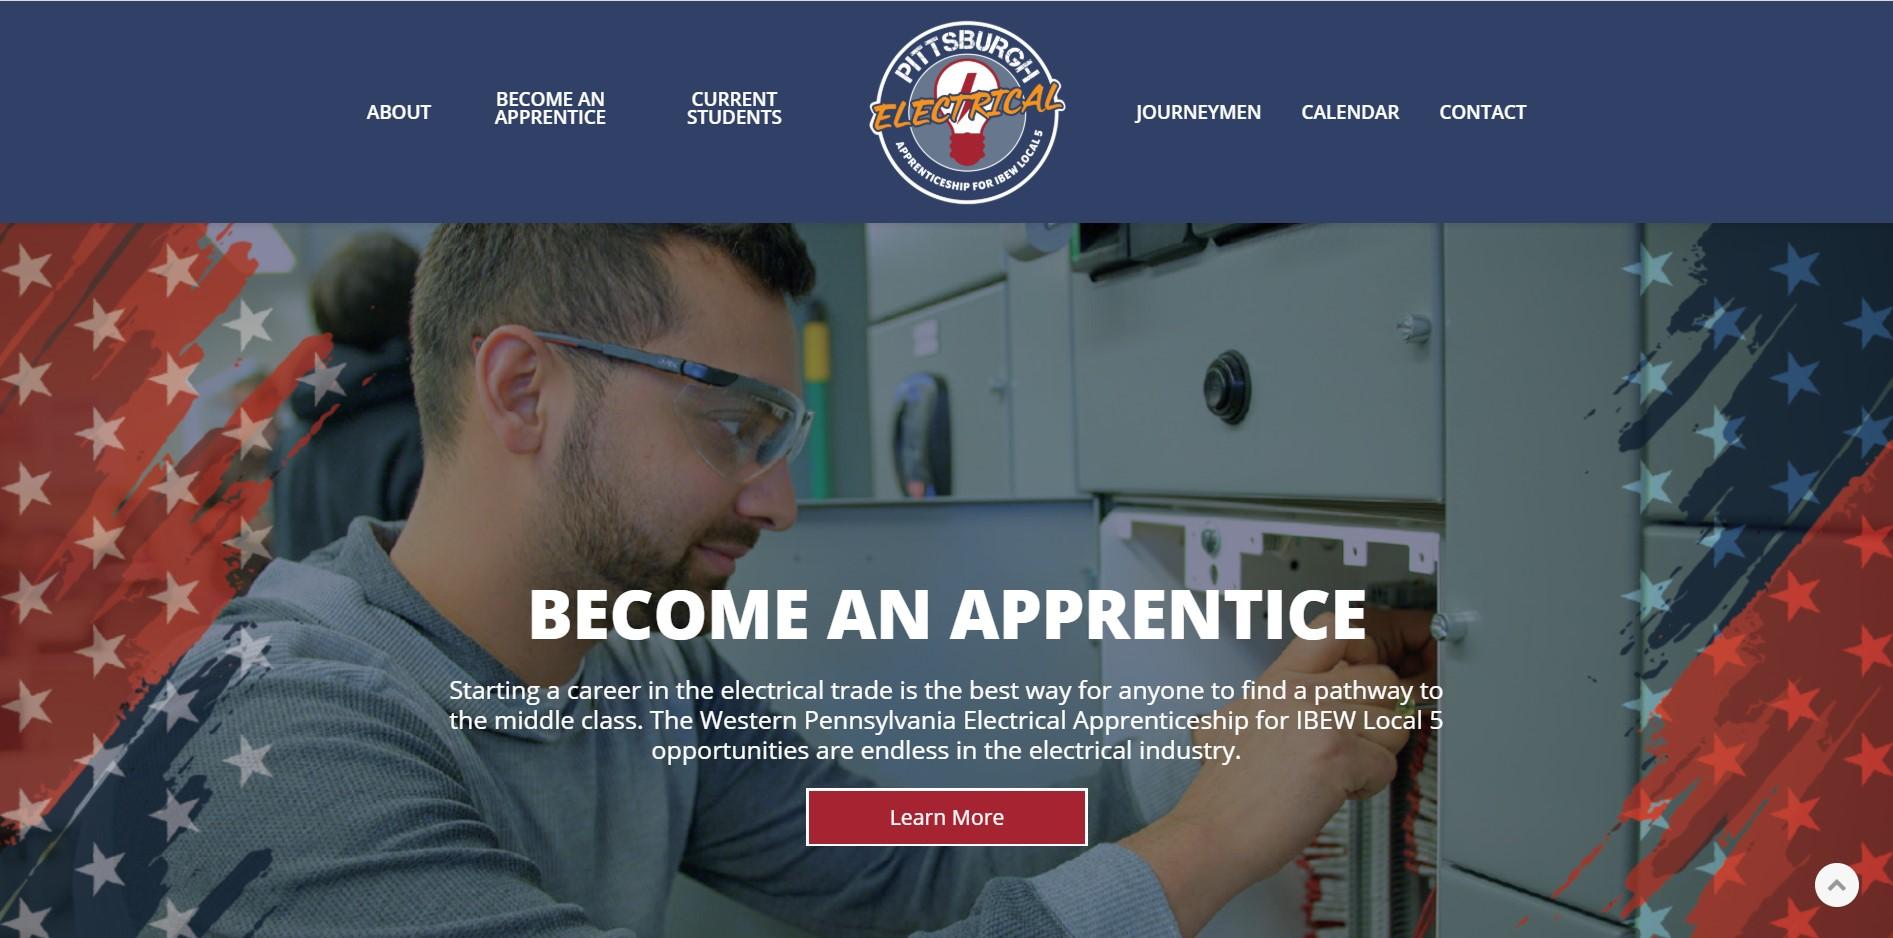 IBEW Union Training Center website built by LaborTools